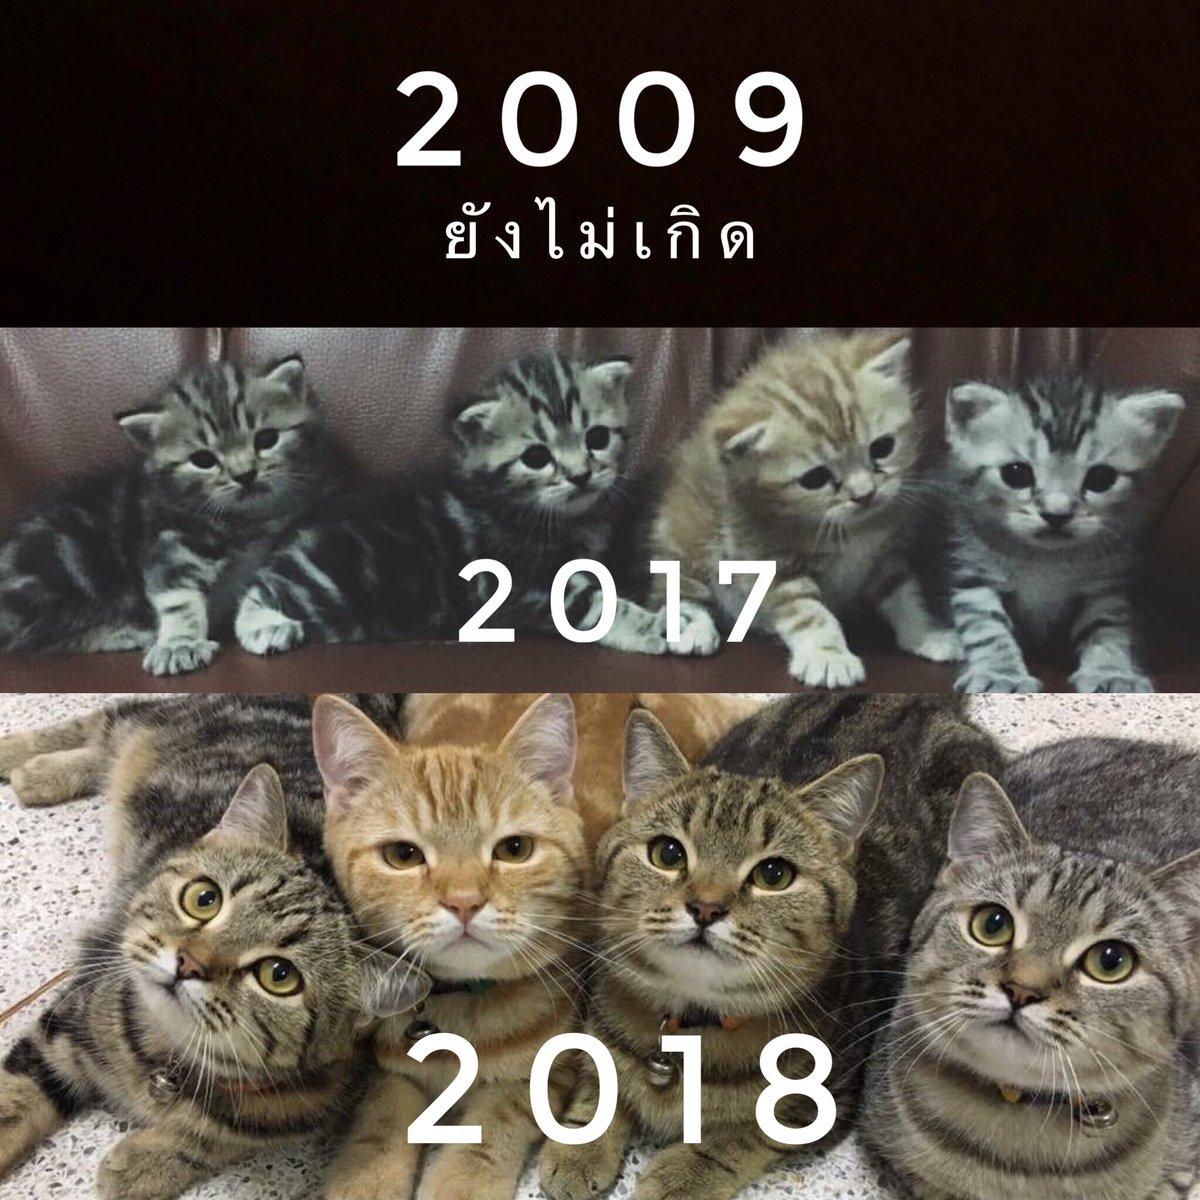 RT @egg_family4: 2019 ถ่ายไม่ได้ กล้องเต็ม😂 https://t.co/LyYxaijZwa